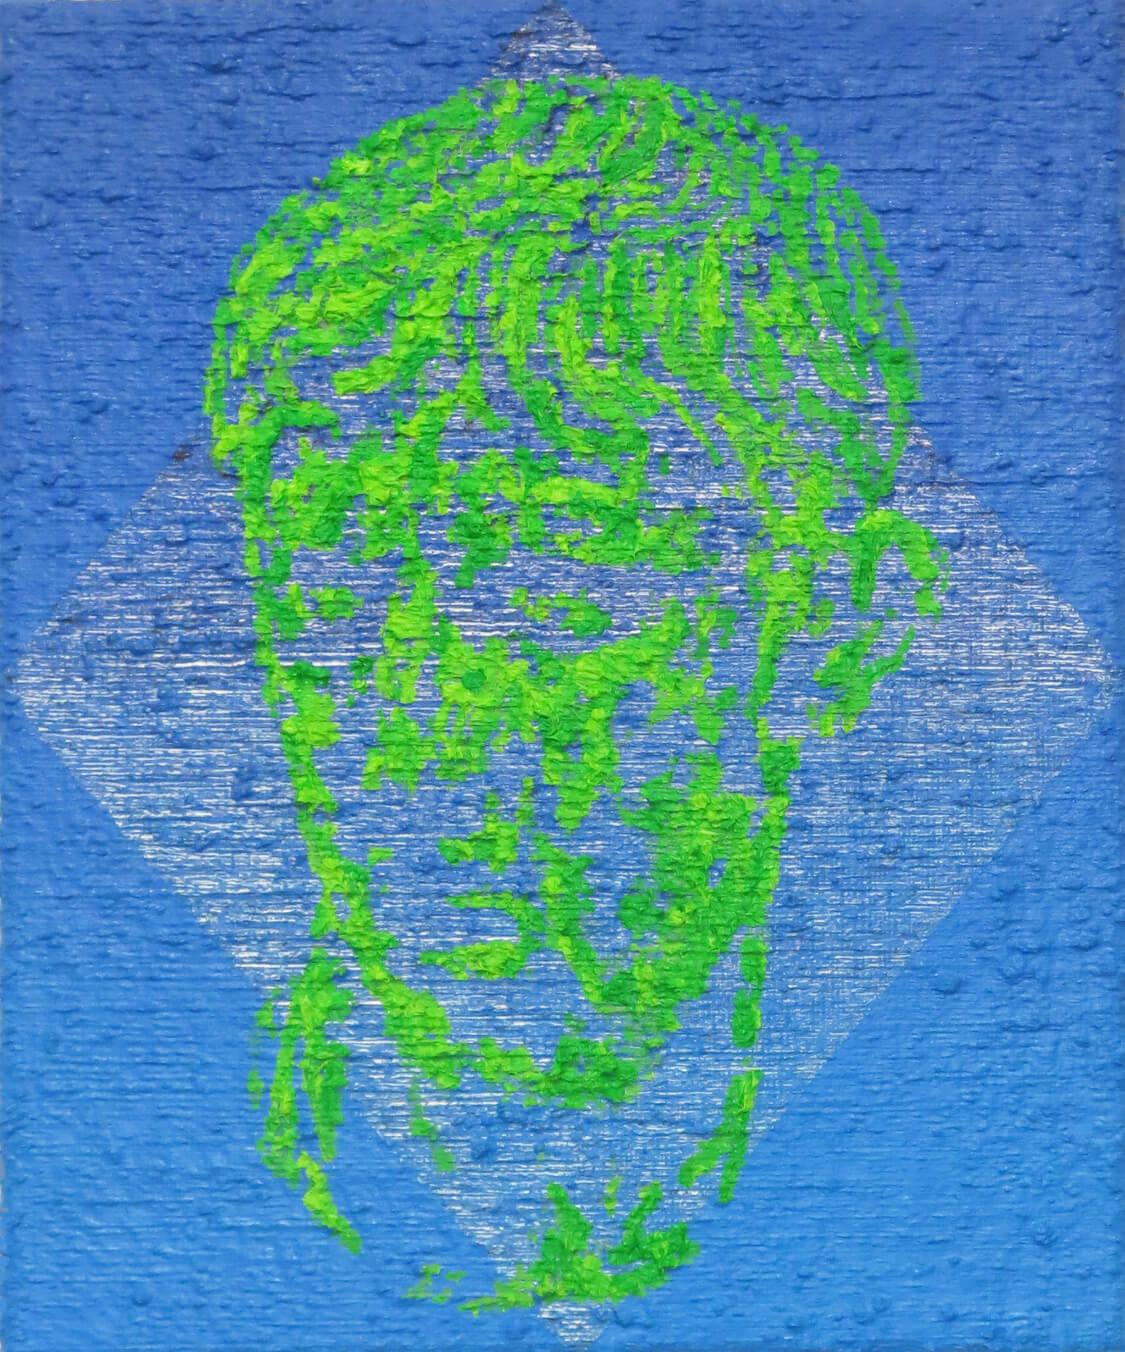 Head VI - Oil on Canvas, 55 x 45 cm, 2016